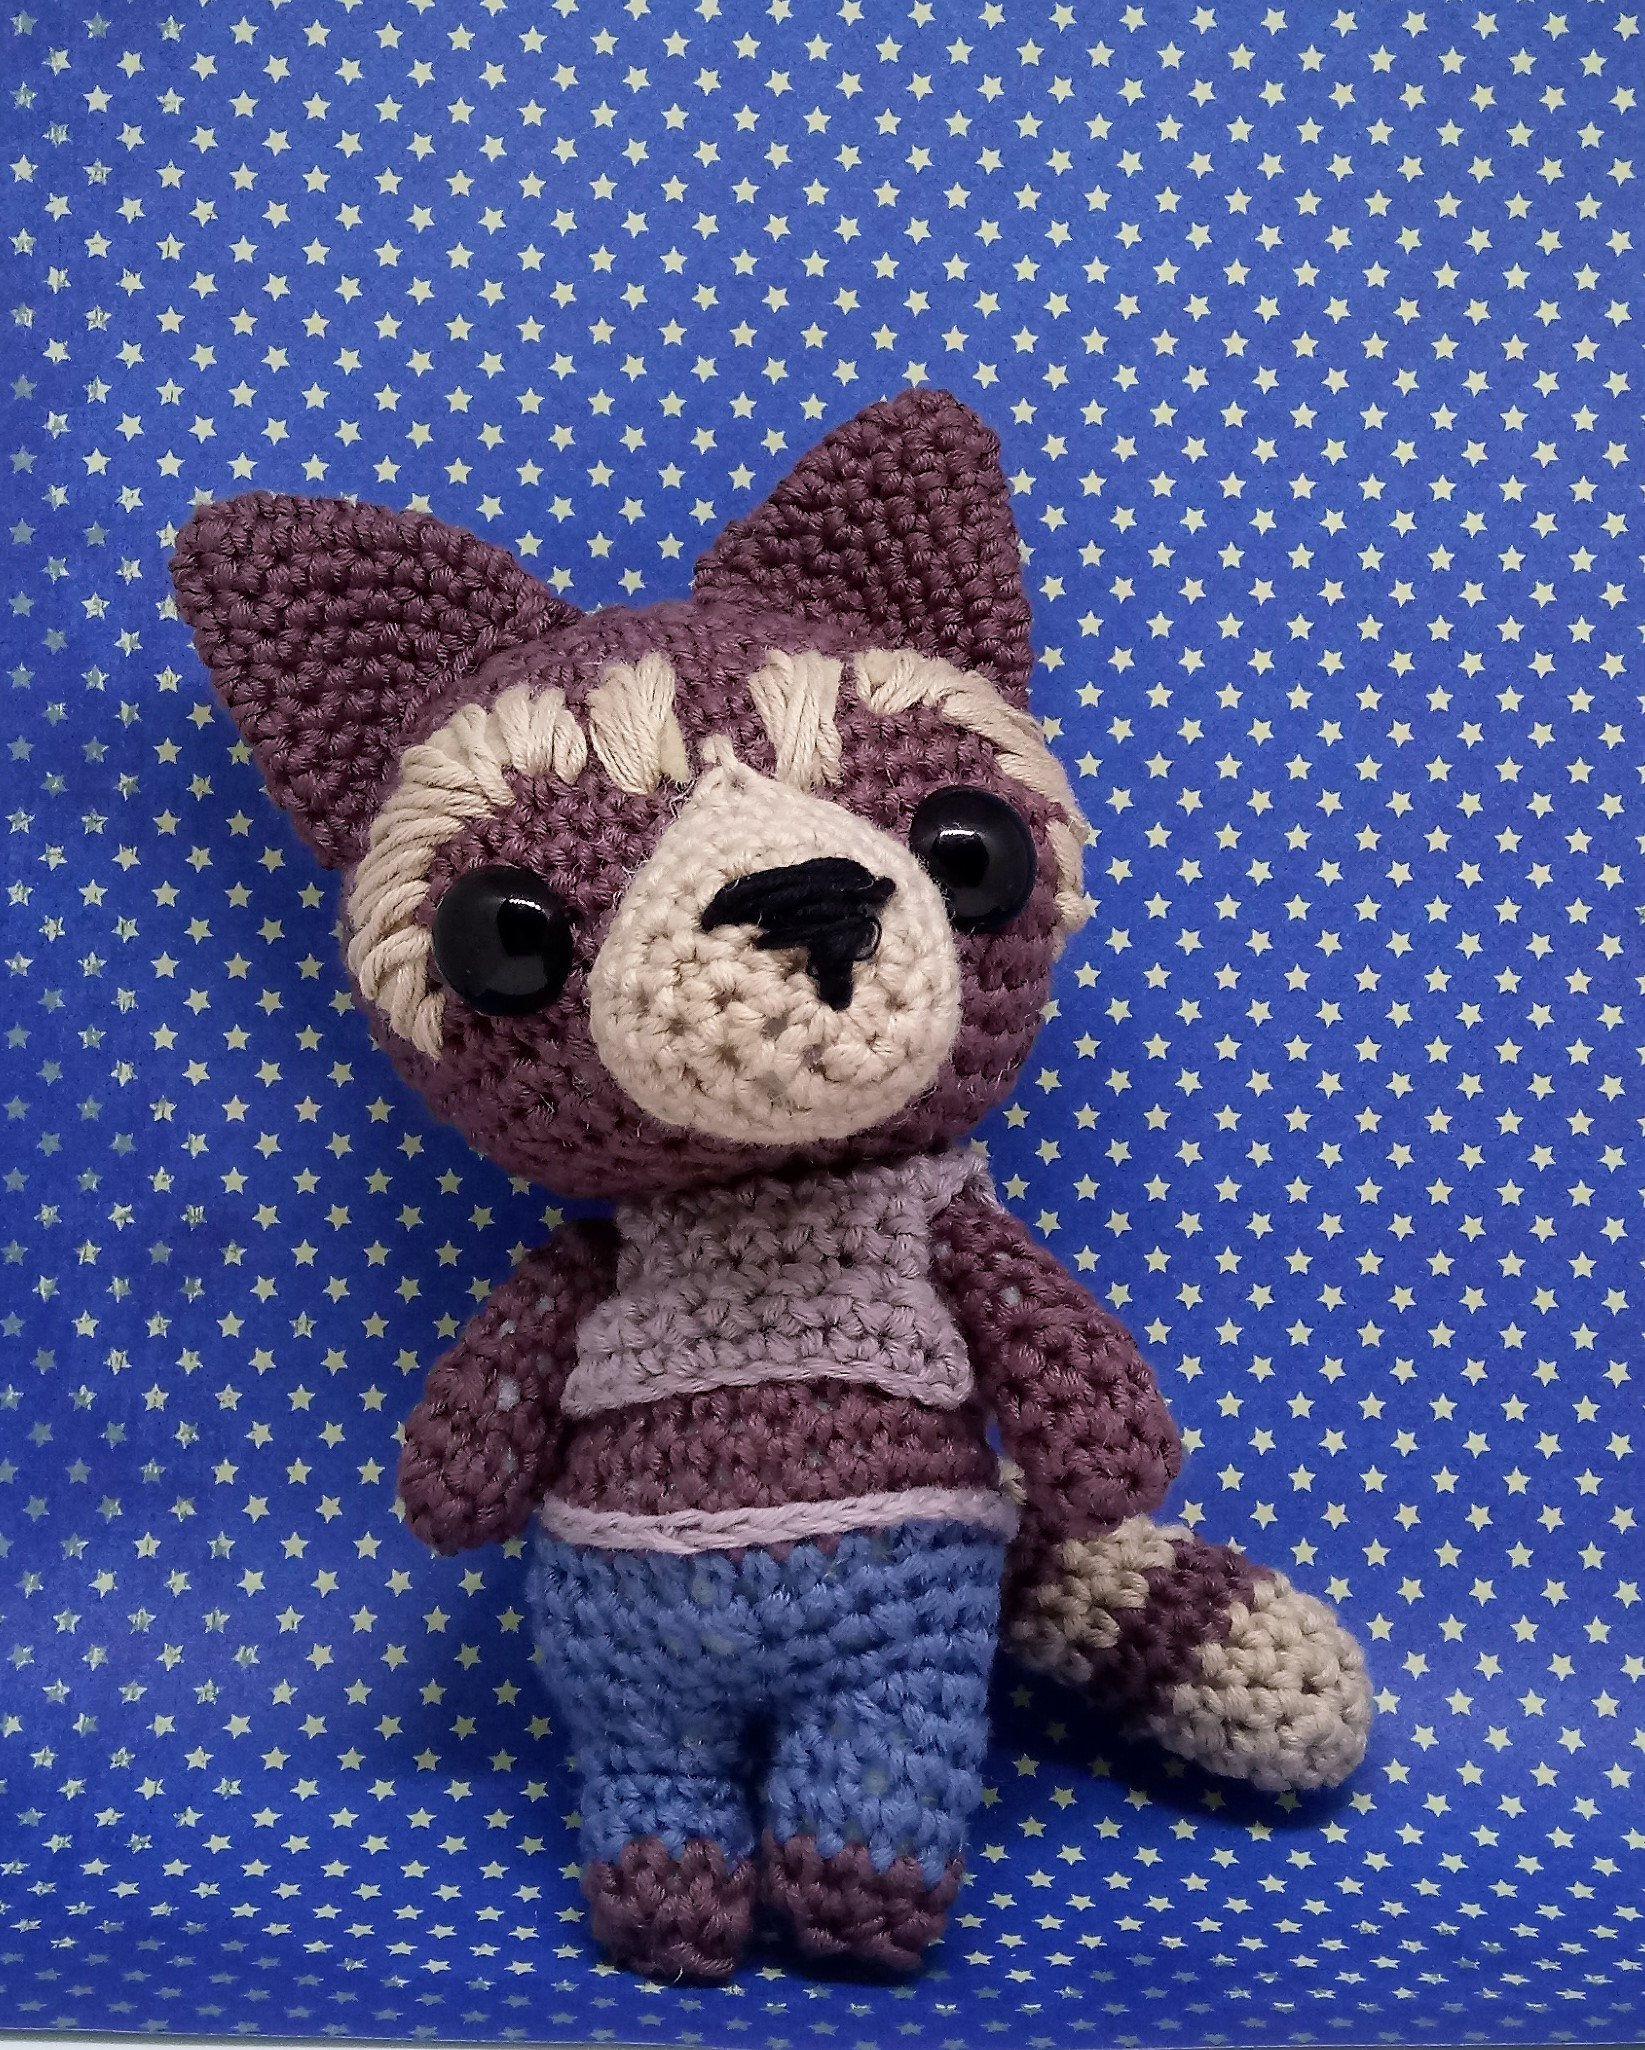 Rocket the racoon amigurumi style pdf crochet pattern inspired by rocket the racoon amigurumi style pdf crochet pattern inspired by guardians of the galaxy by amigurumibarmy bankloansurffo Gallery